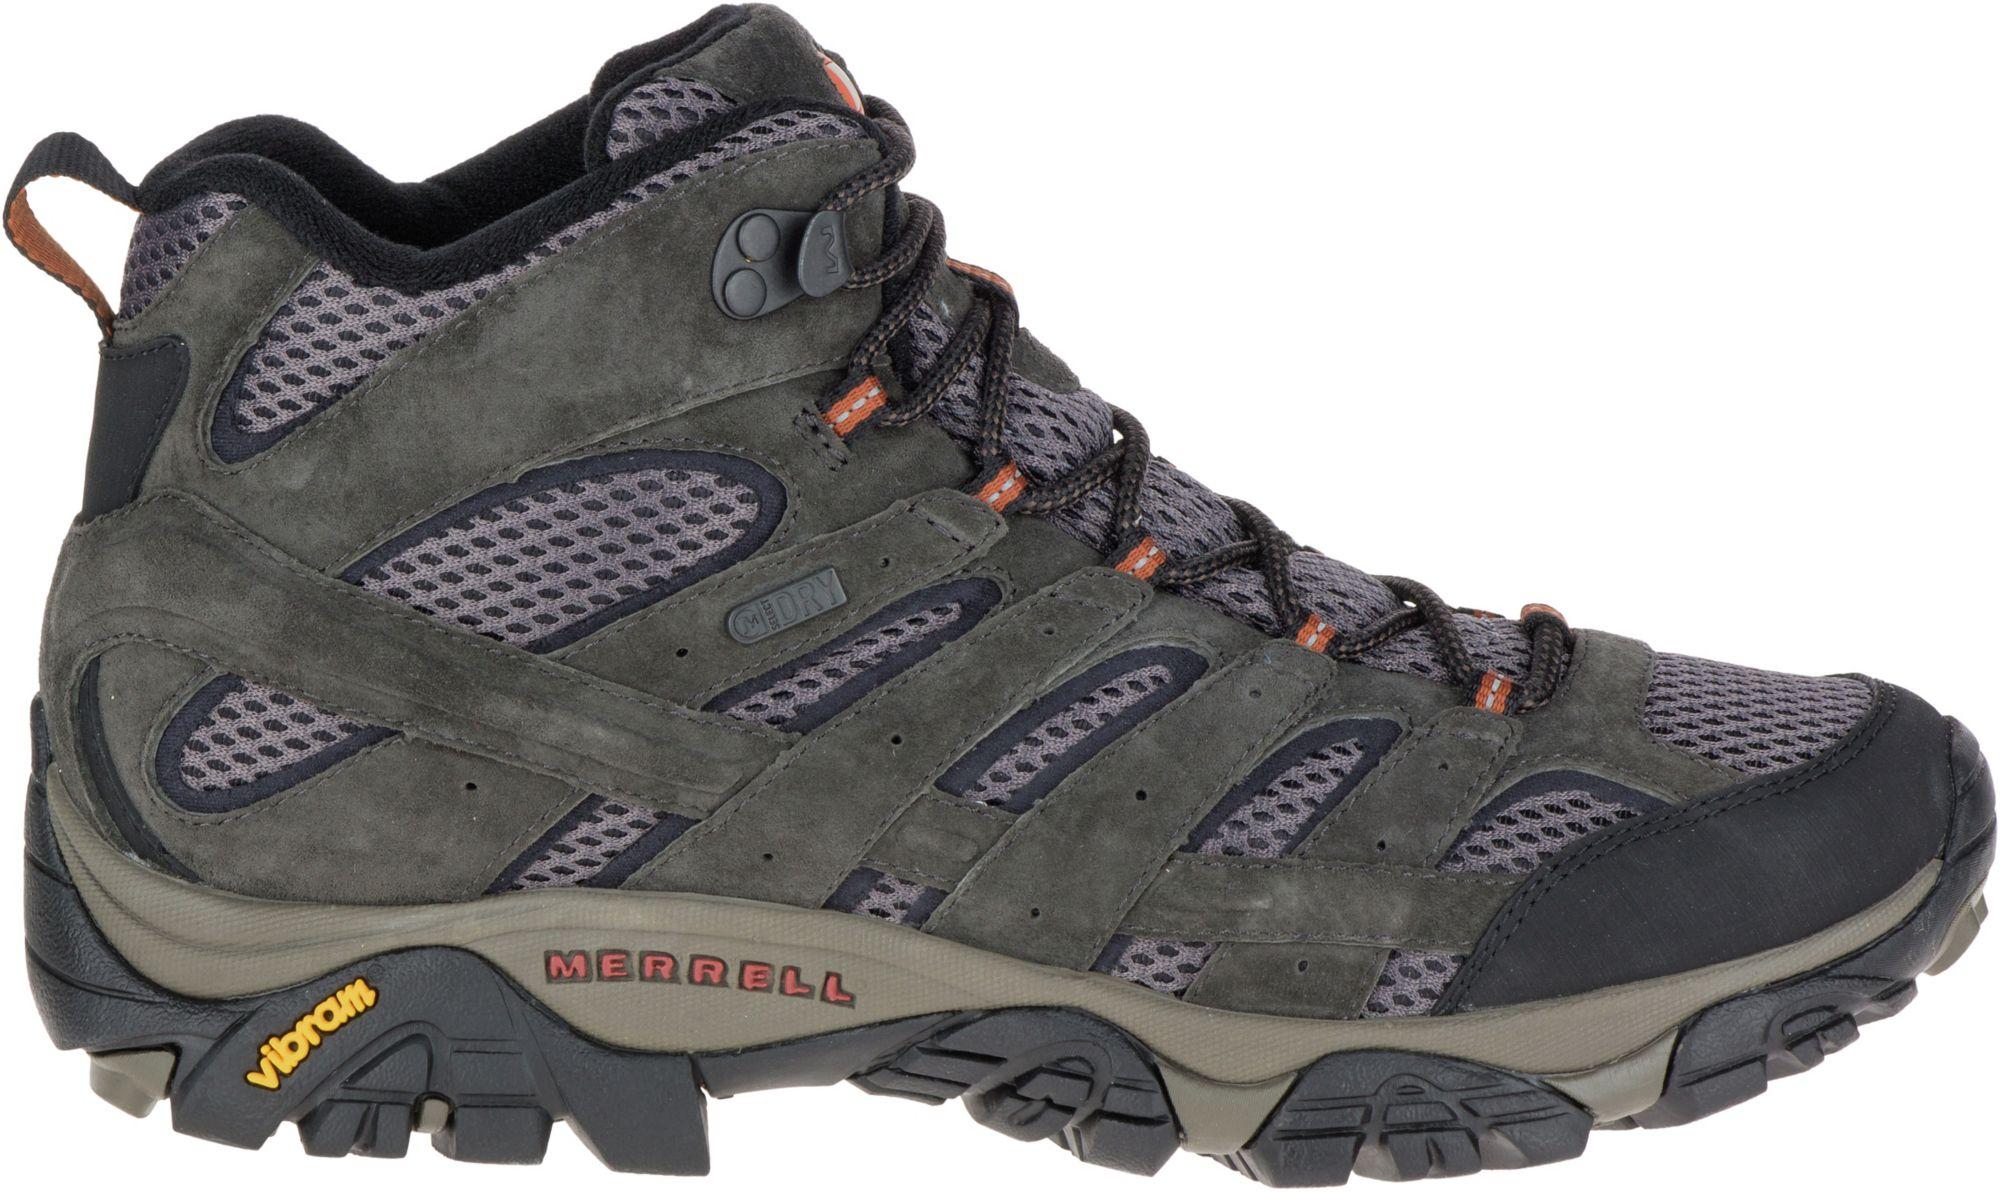 mens waterproof boots merrell menu0027s moab 2 mid waterproof hiking boots | dicku0027s sporting goods ektqypc